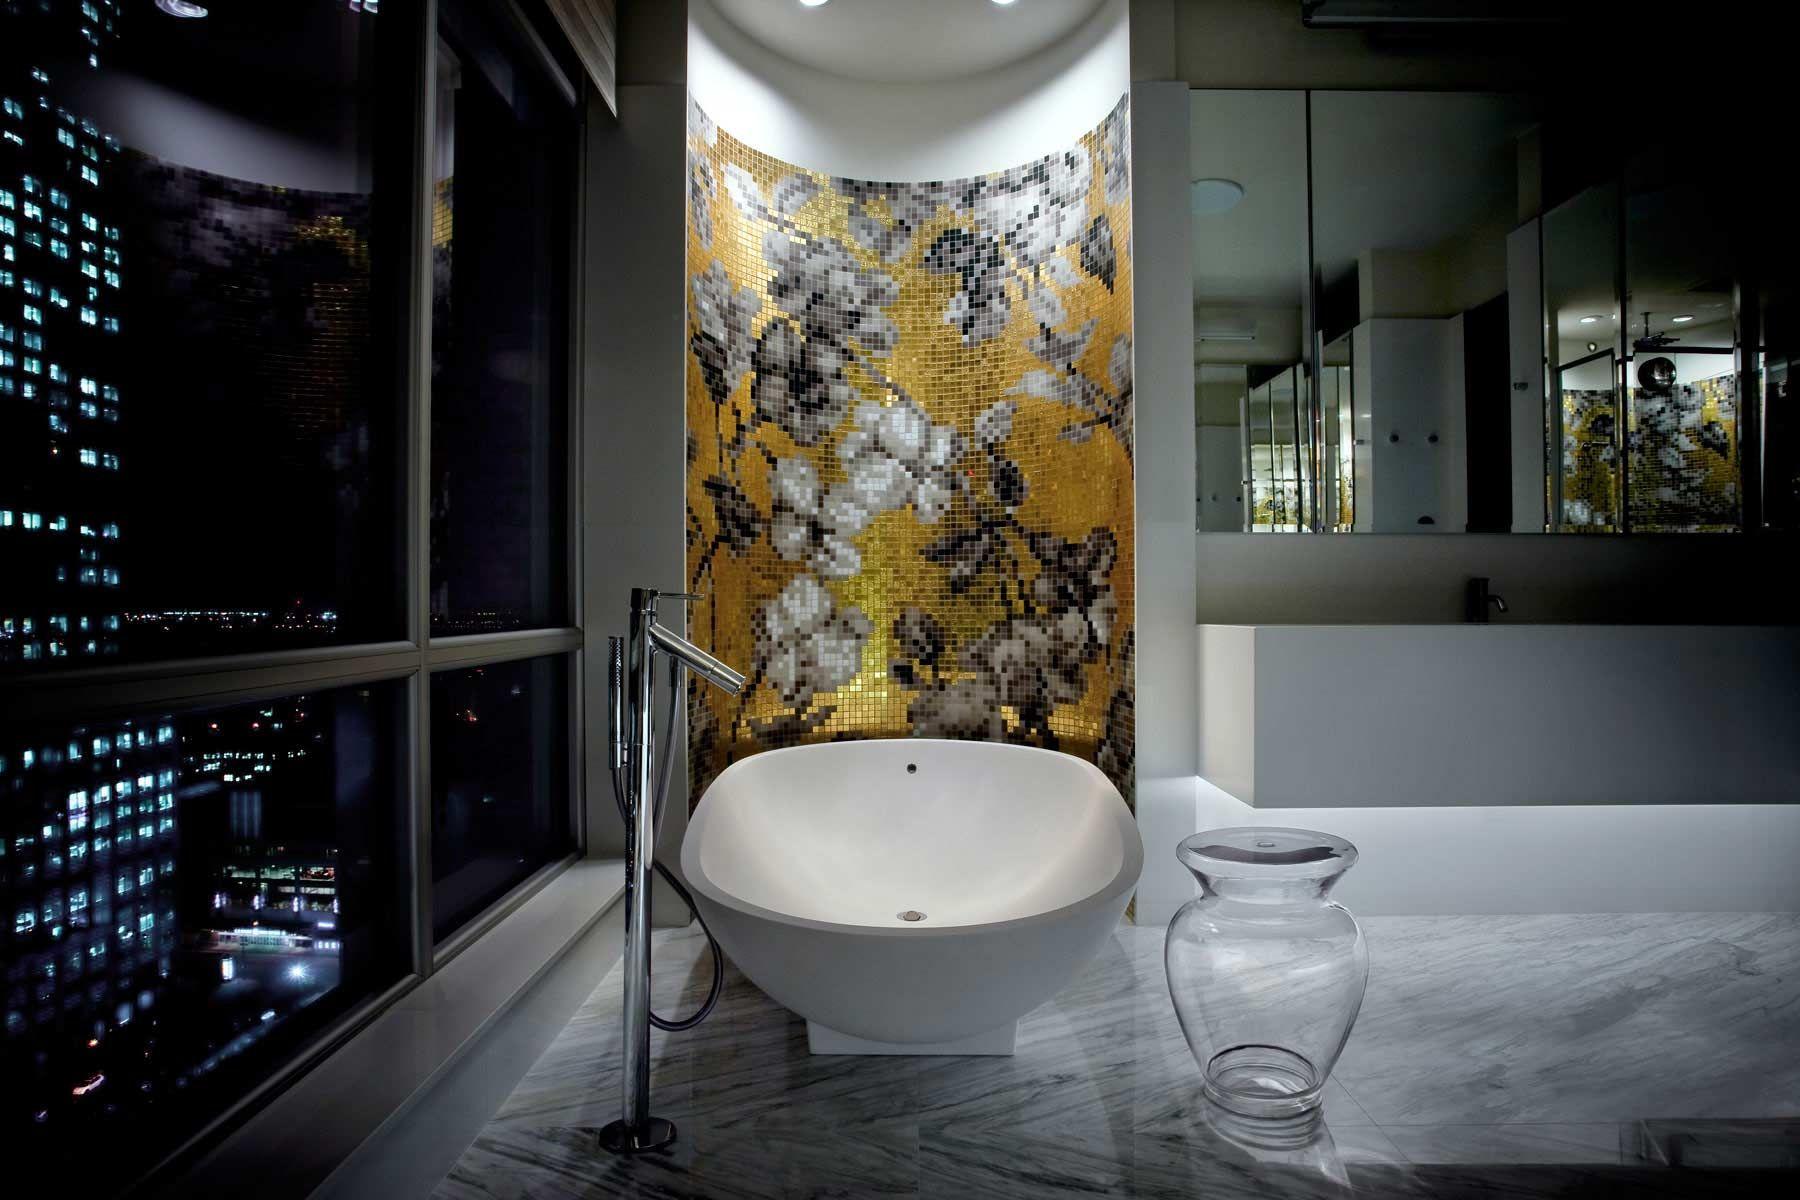 Projet Penthouse Centre Vill Montreal Modern Bathroom Decor Luxury Penthouse Bathroom Design